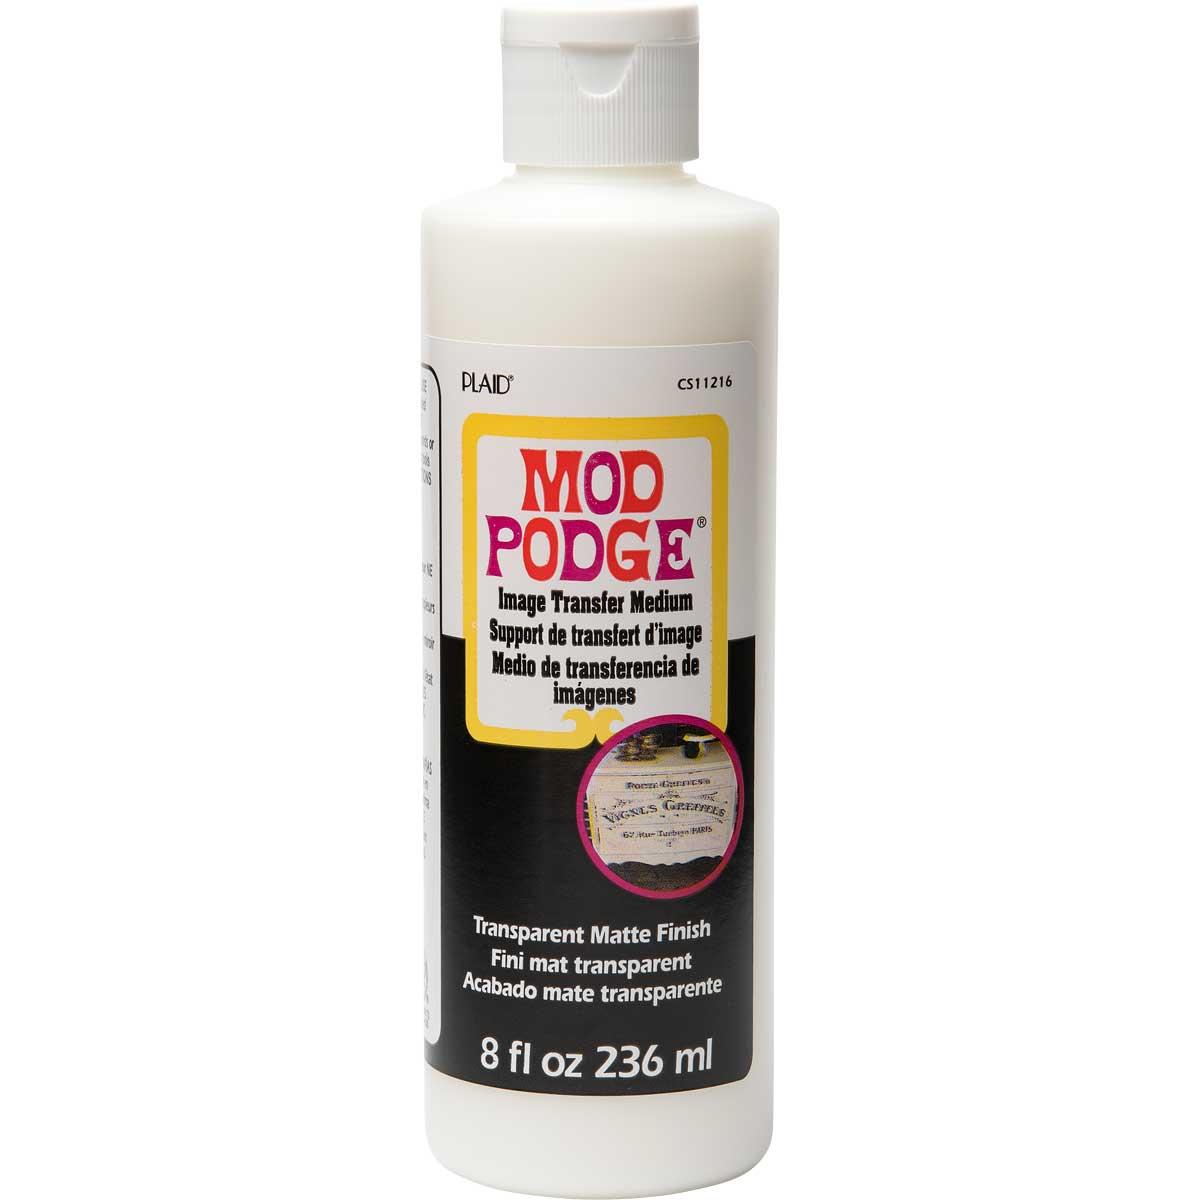 Mod Podge ® Image Transfer Medium Clear, 8 oz.